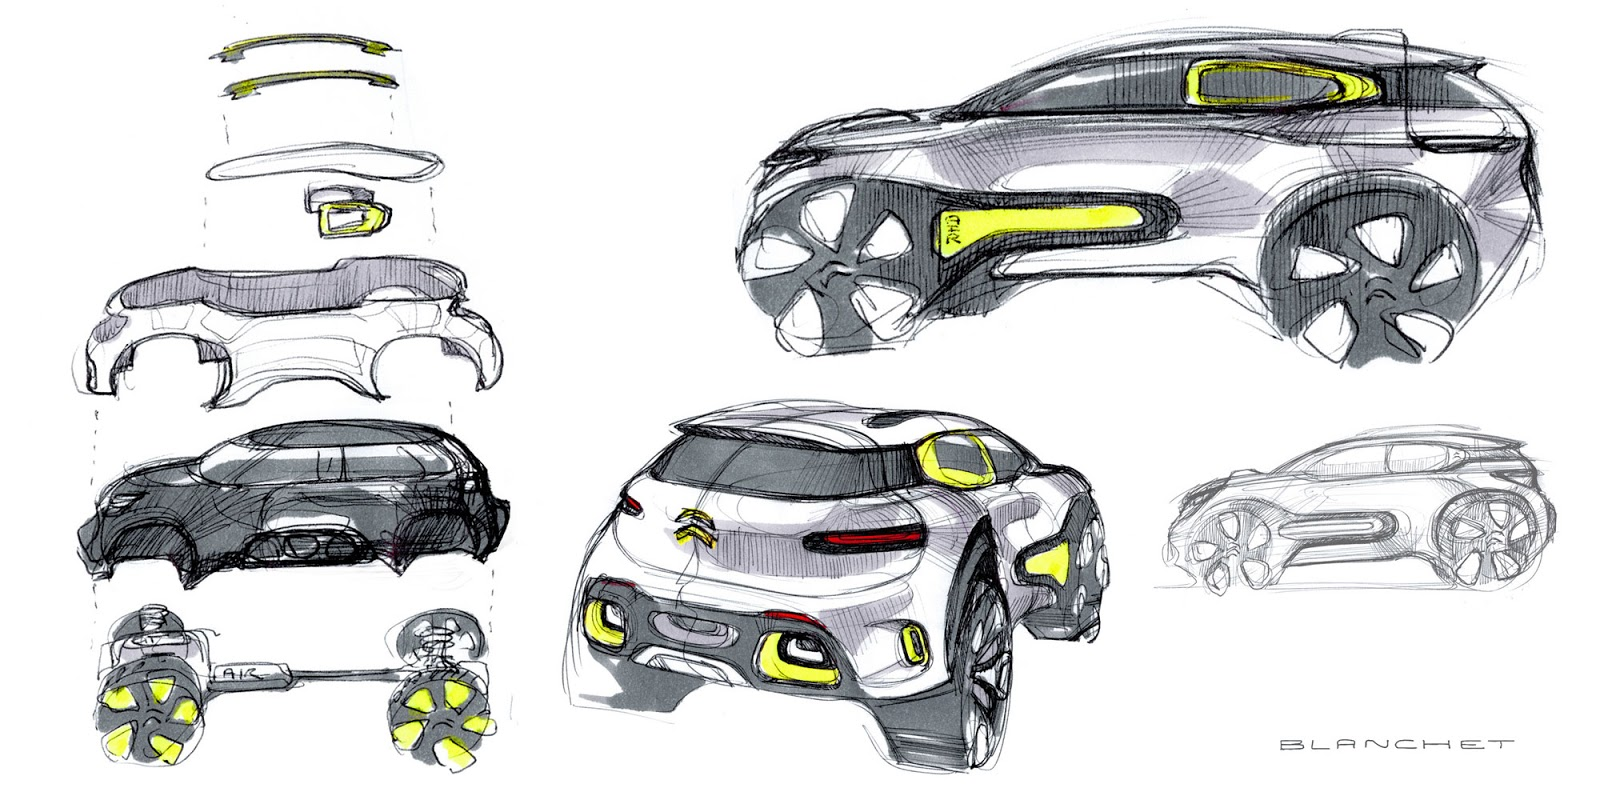 Citroen Aircross concept 2015 idea sketches by Gregory Blanchet